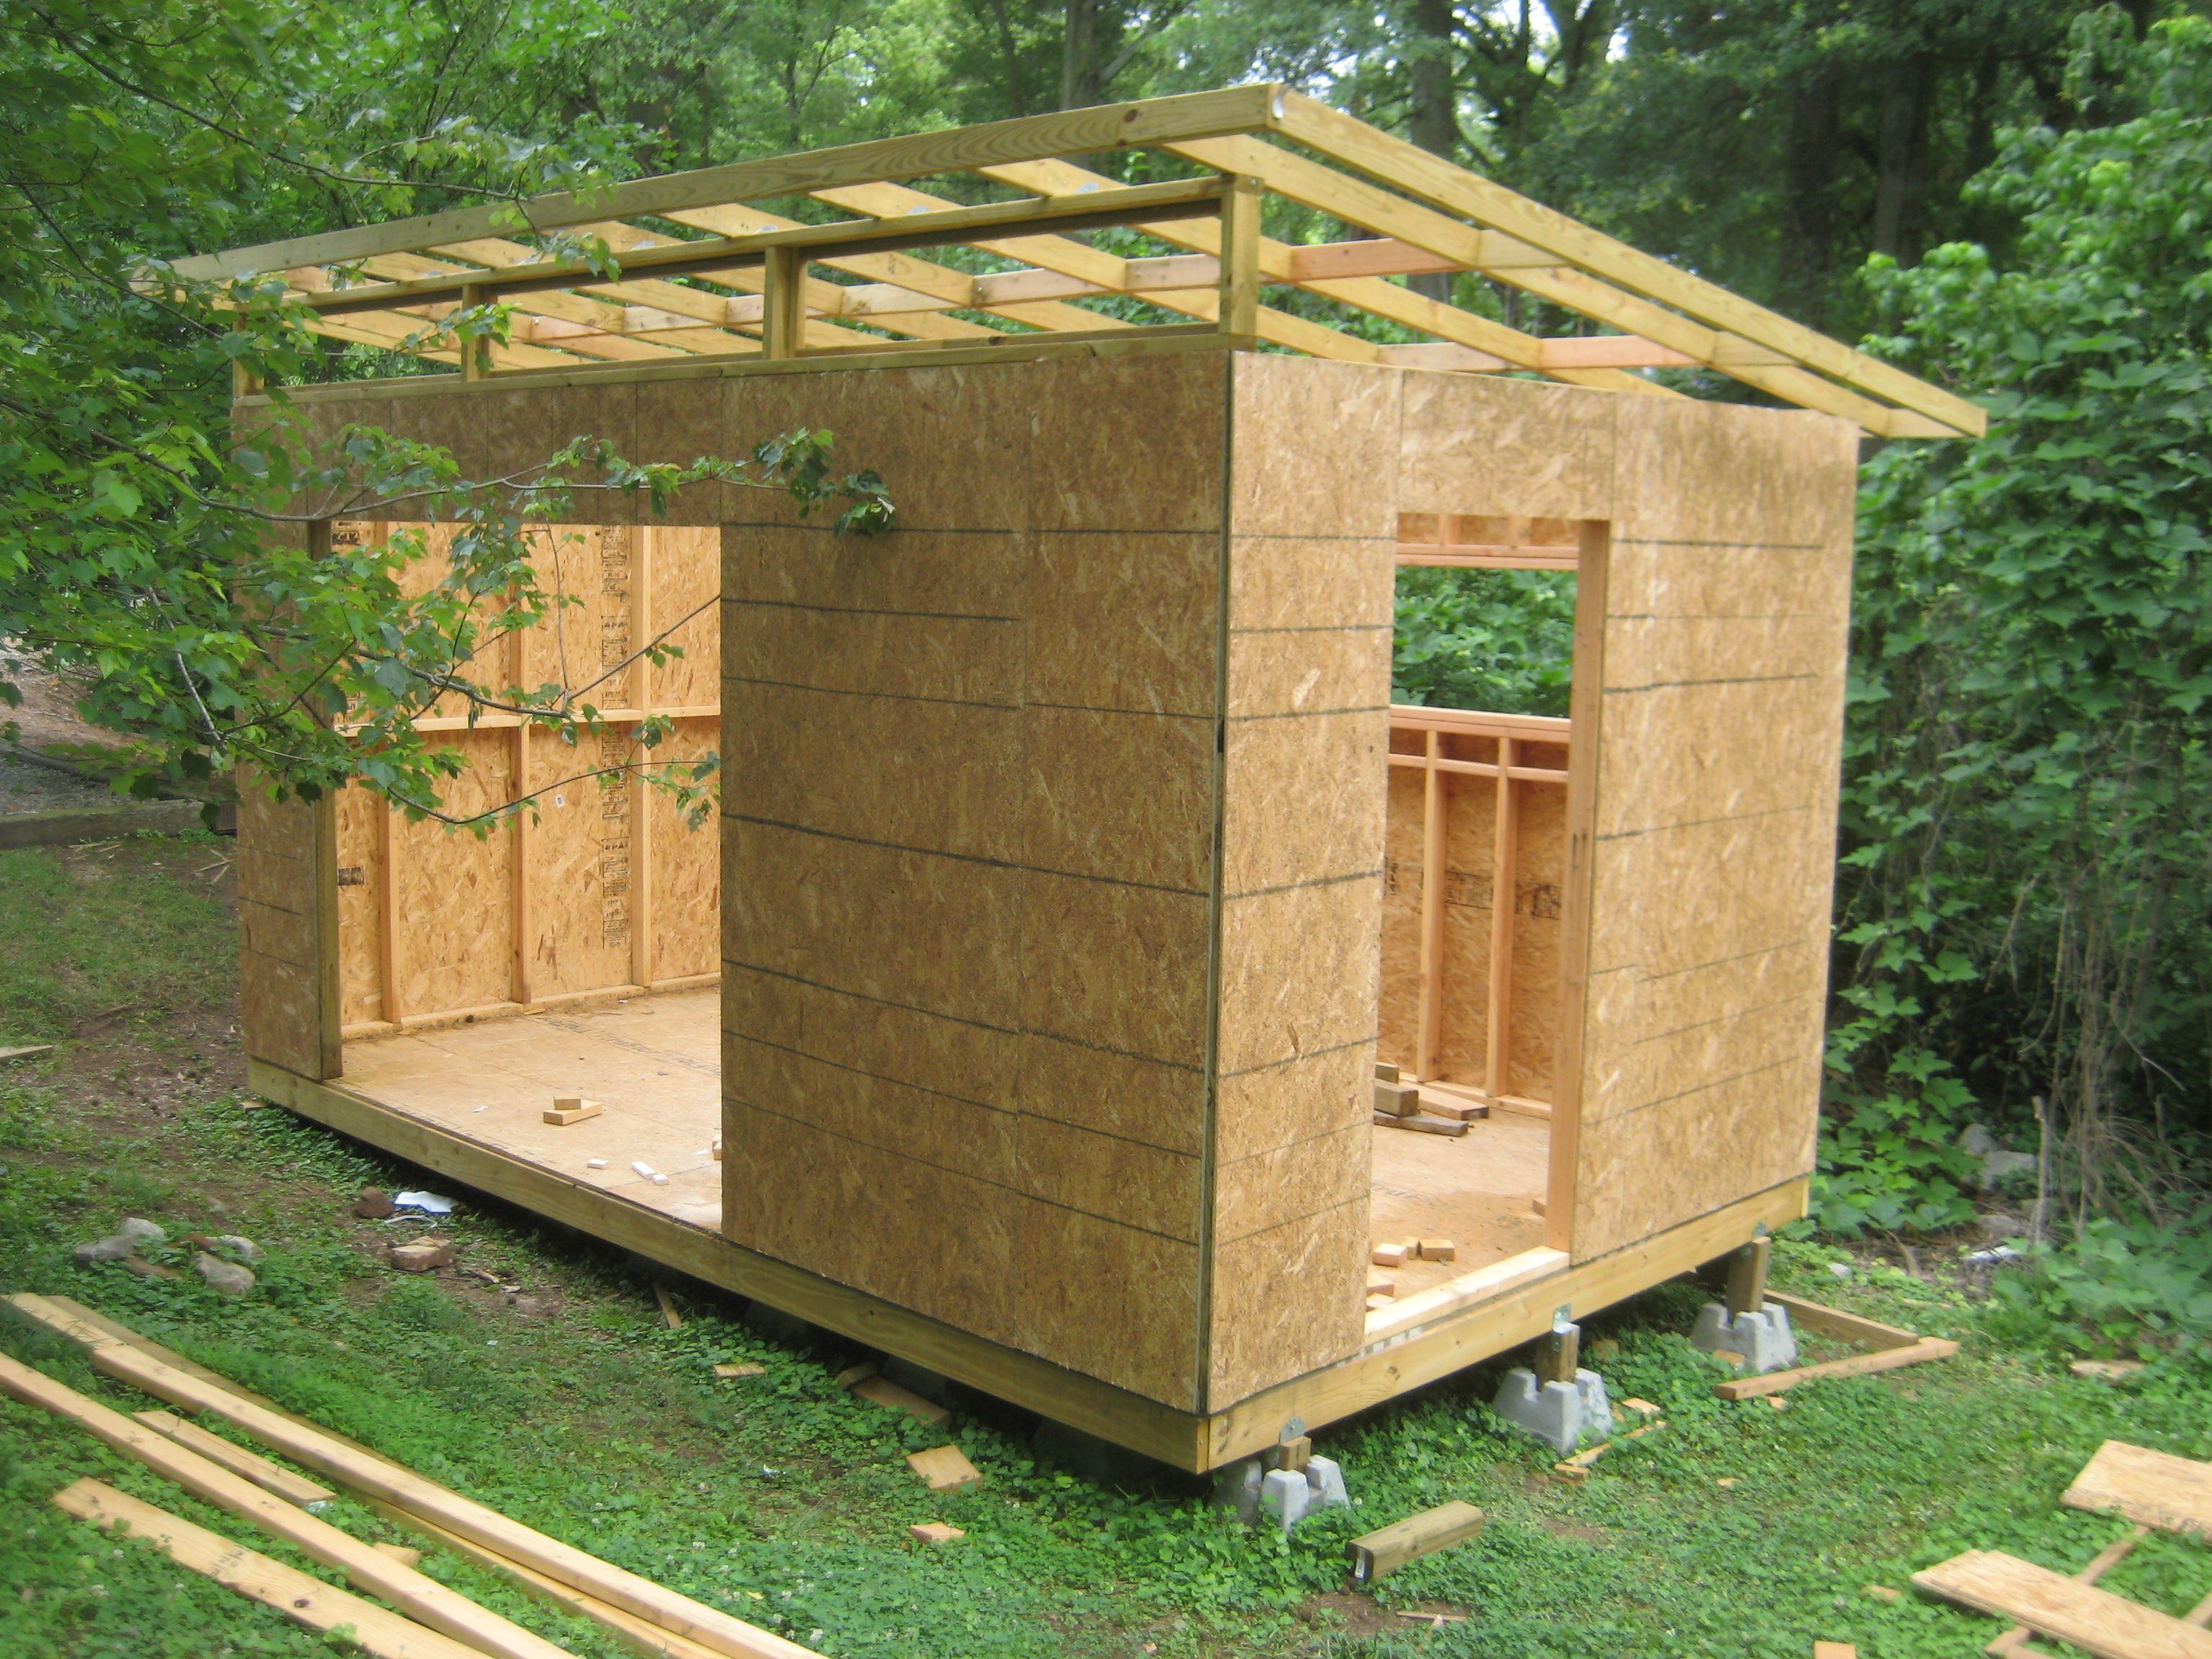 Diy modern shed project shed design building a shed